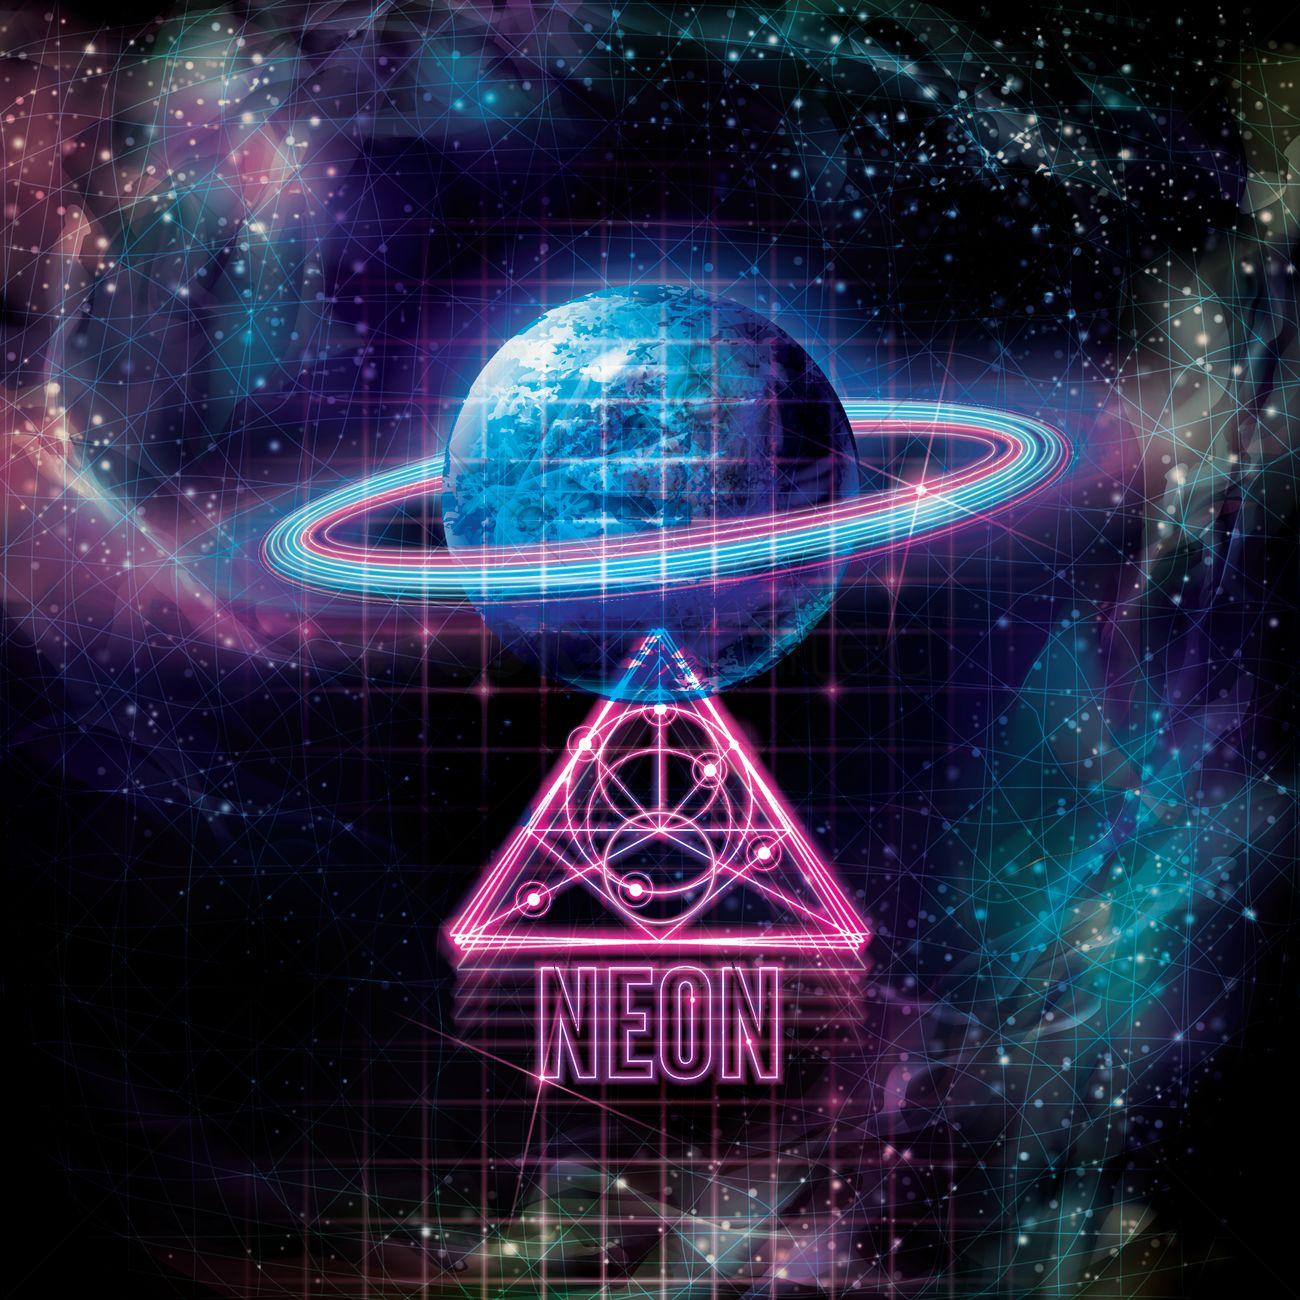 Galactic Neon Design Vector Image 1962548 Stockunlimited